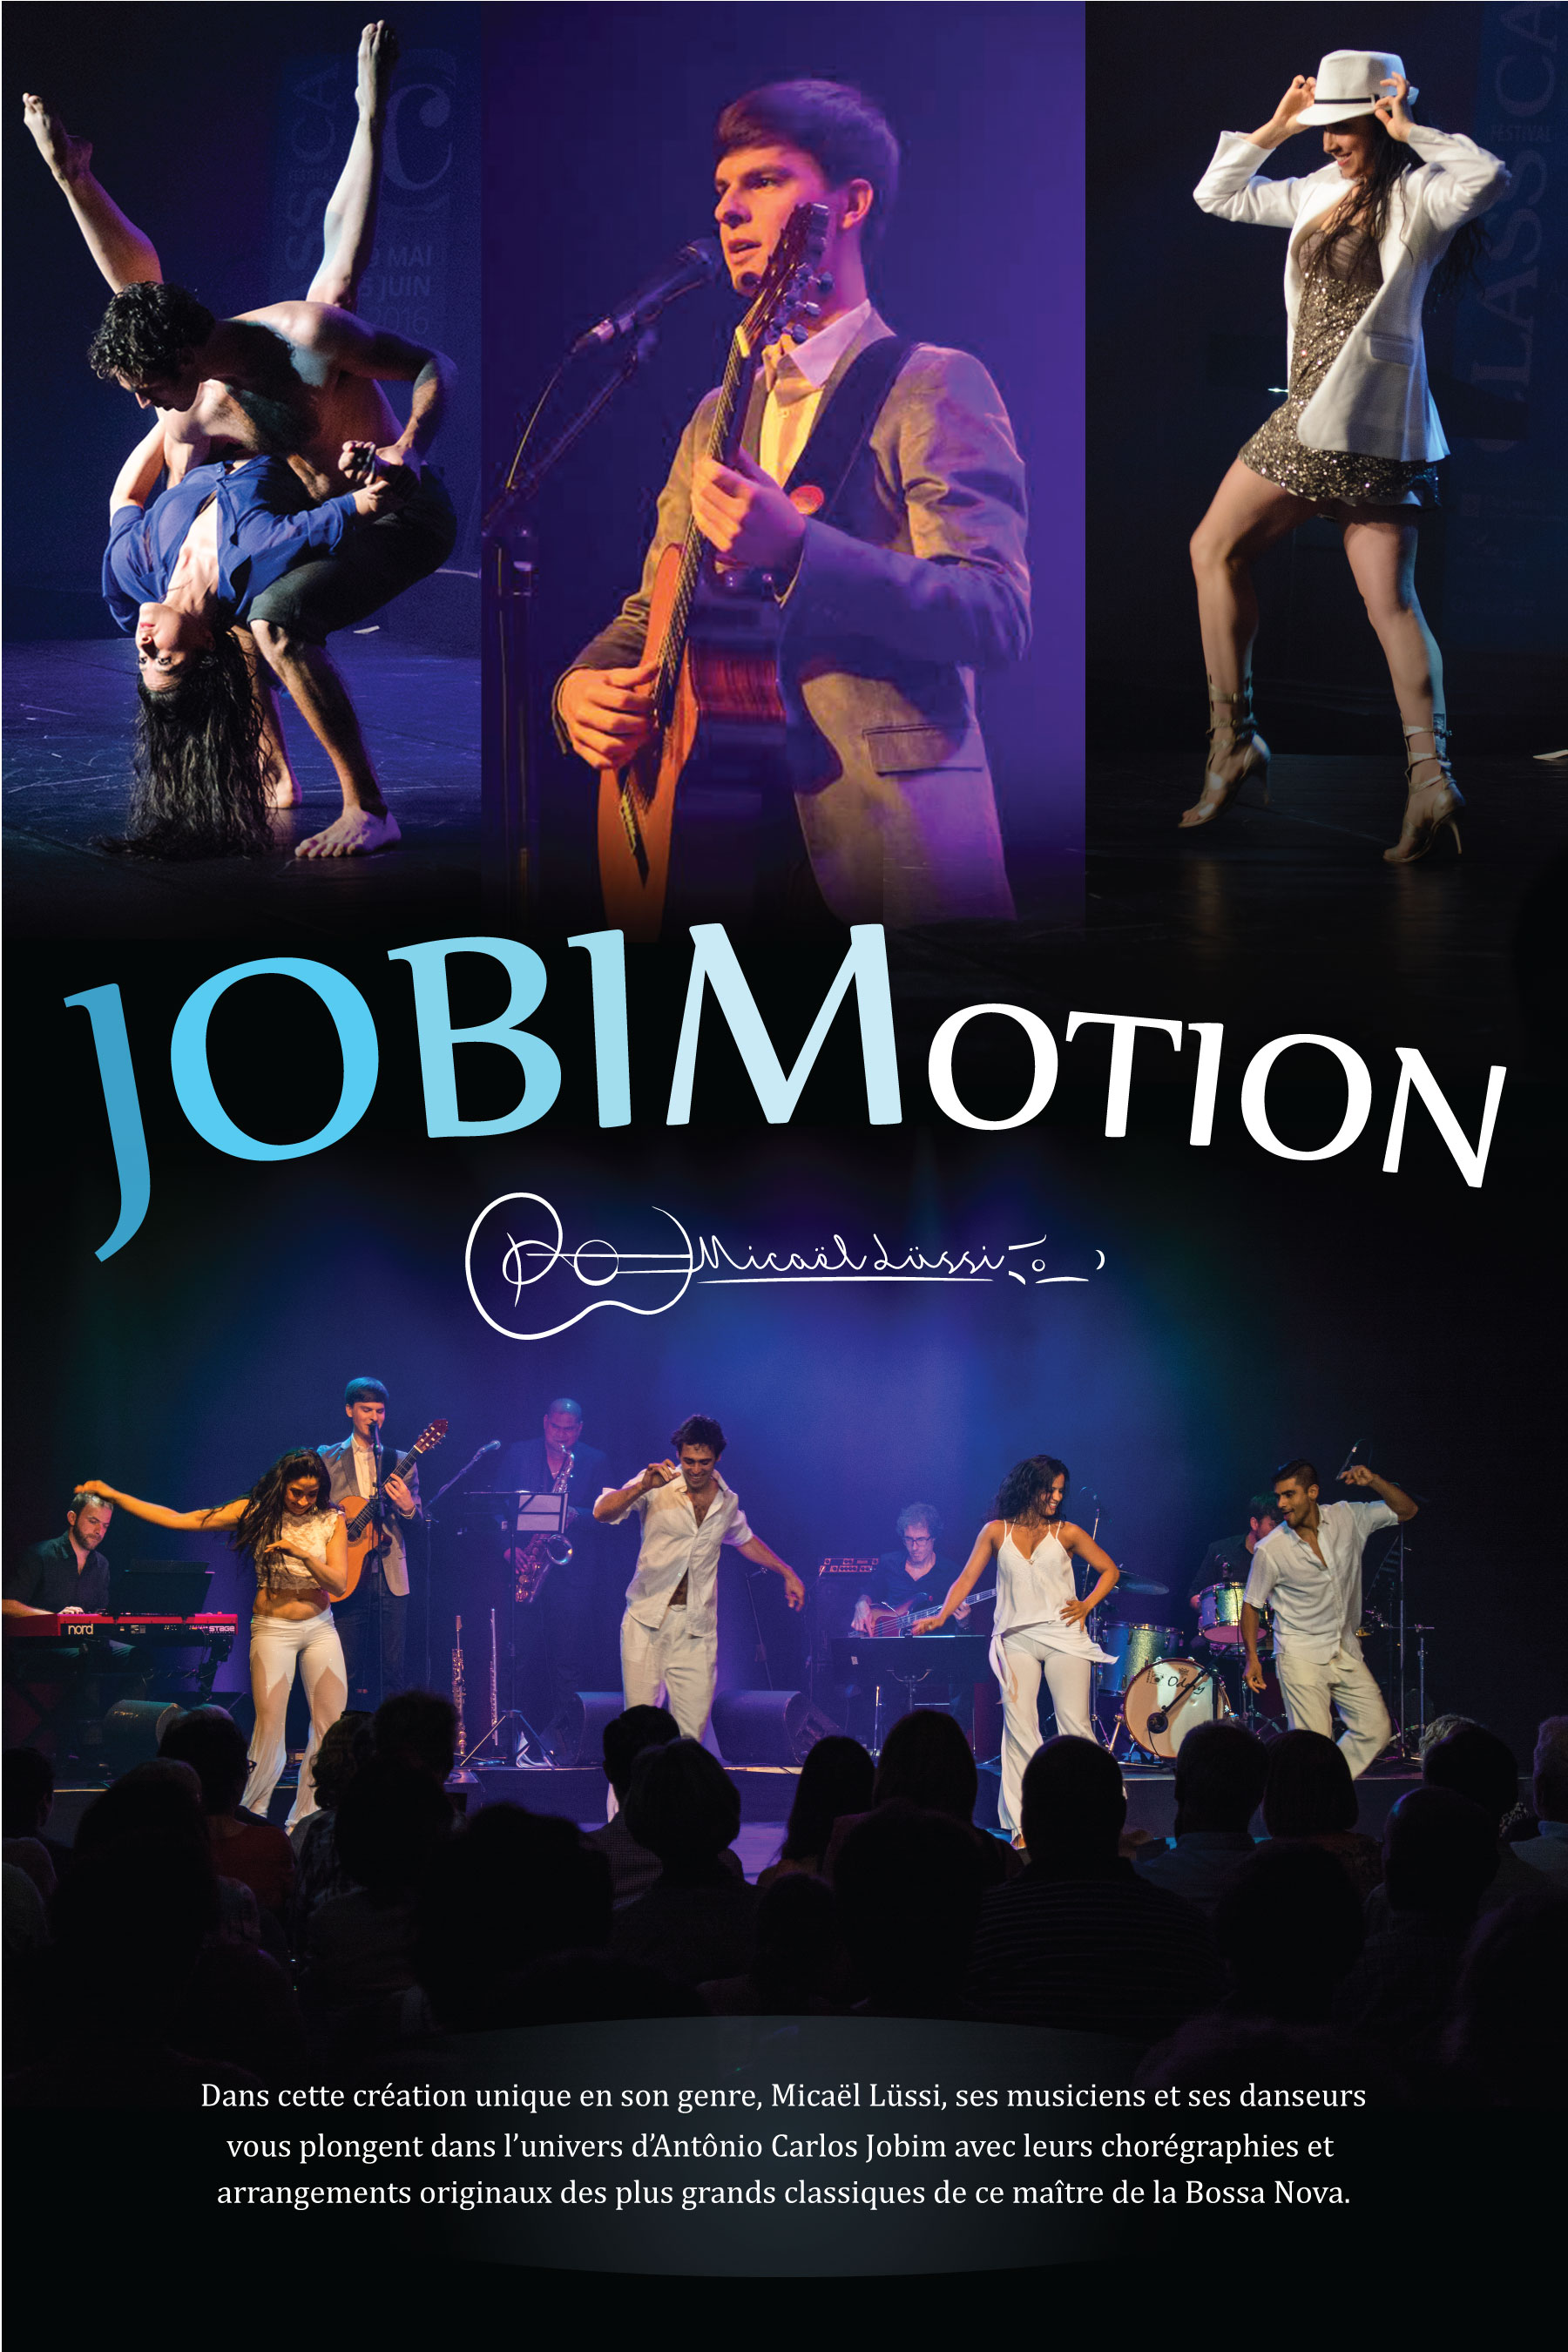 Jobimotion_Micaël Lüssi_Affiche